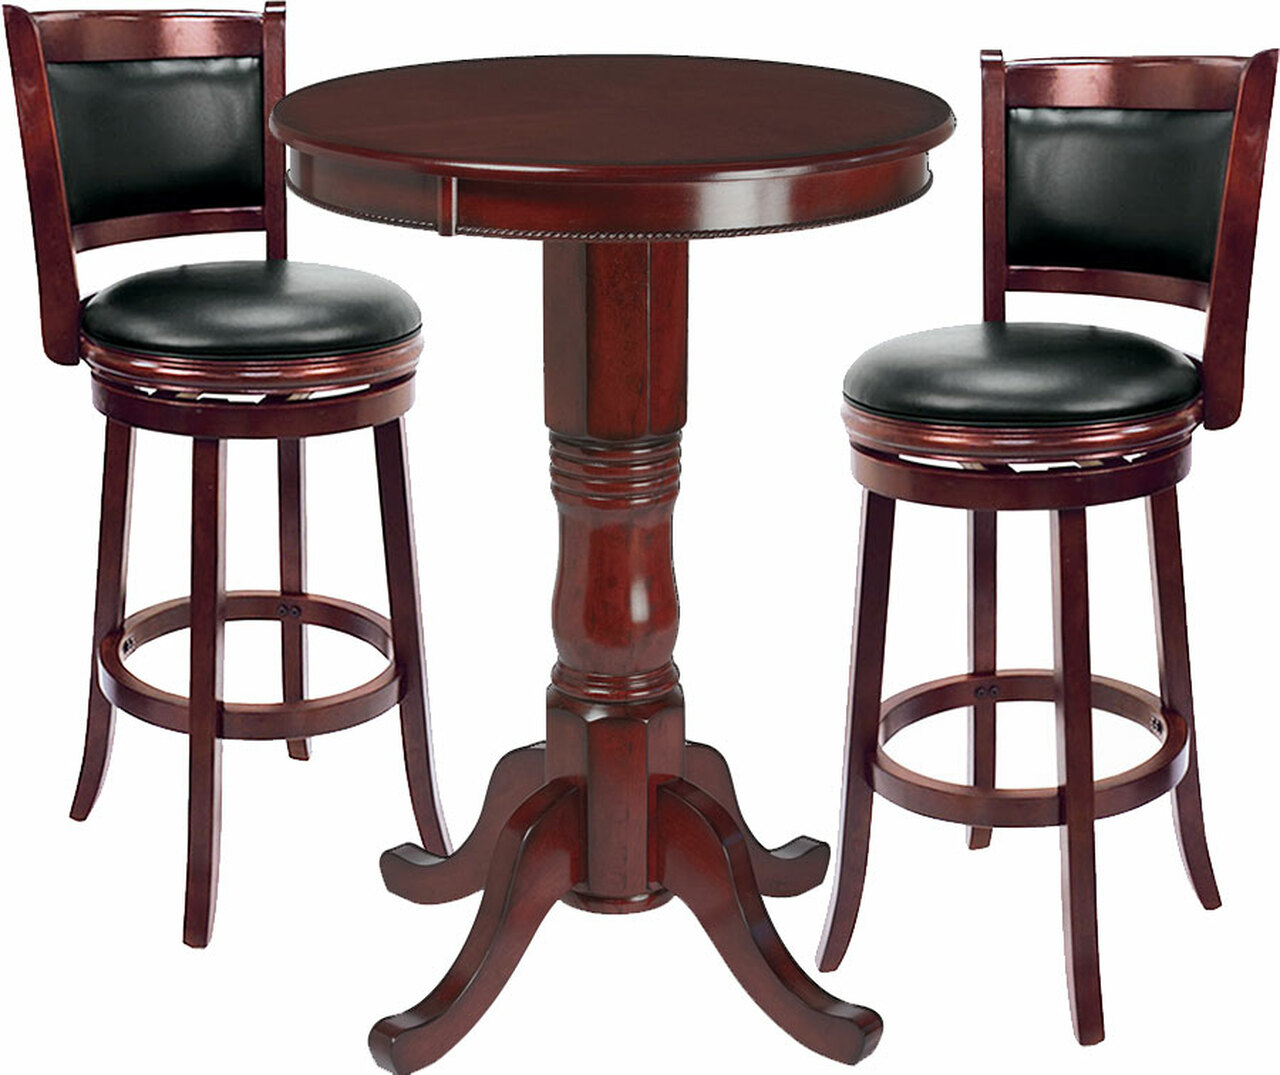 Ram Pub Table Set 3 Piece English Tudor Ozone Billiards